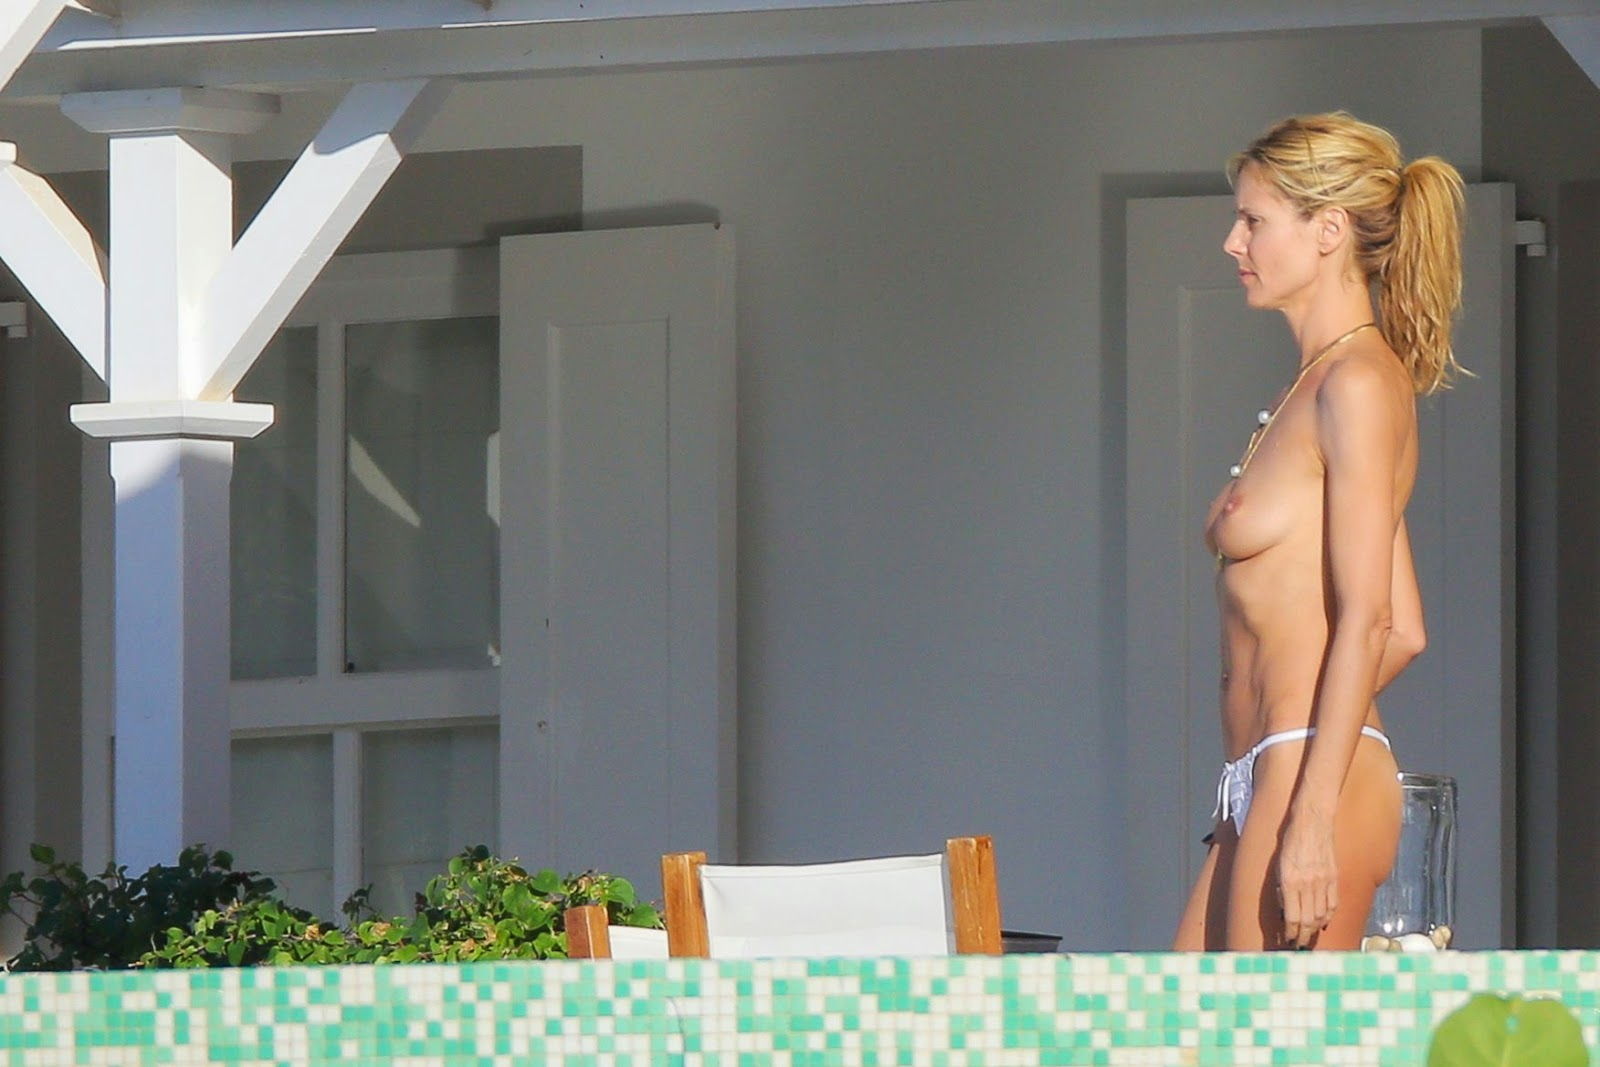 imagetwist.com nude 3 Heidi Klum Topless Bikini Candid Photos Sunbathing In St. Barts | Gutter  Uncensored